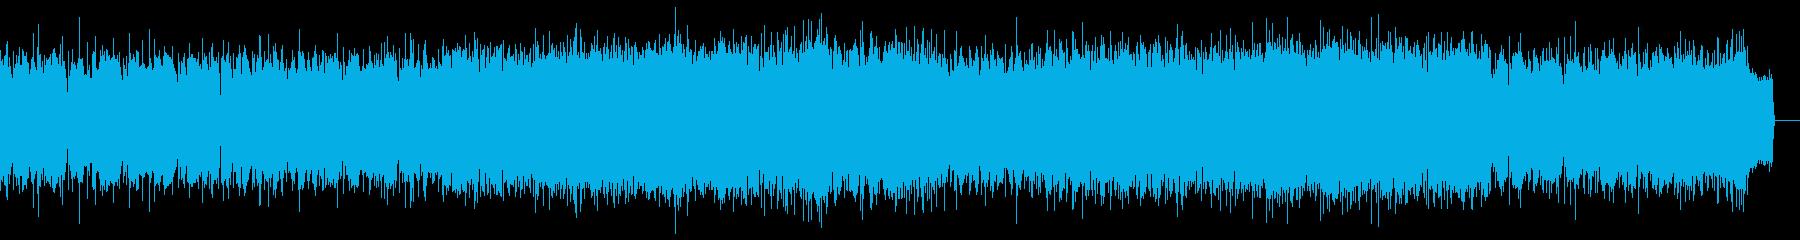 BrainDestructionシンセ無の再生済みの波形